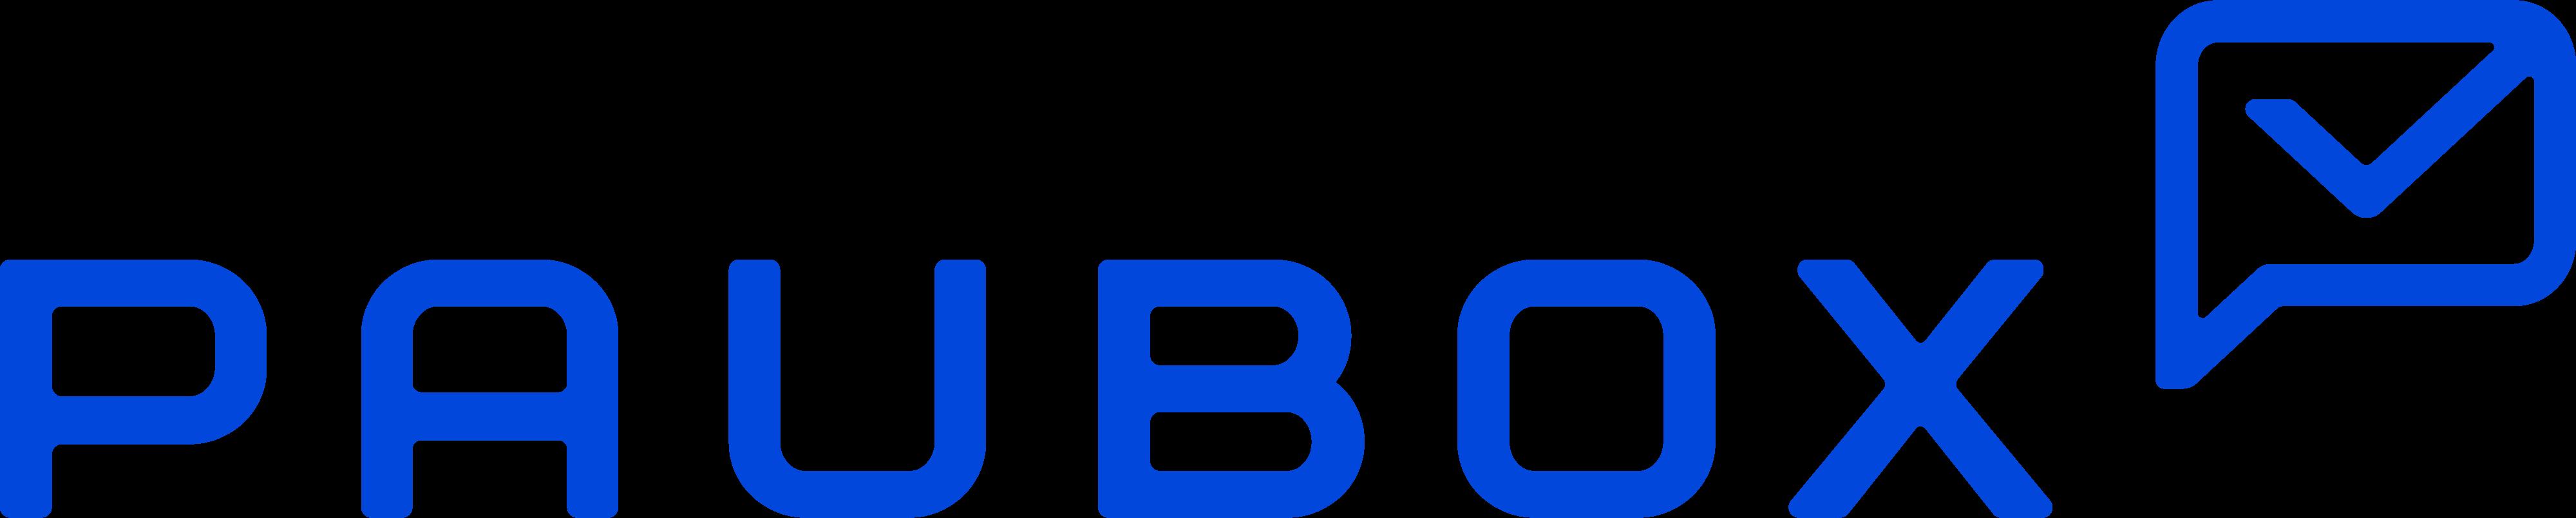 Paubox Email Suite logo